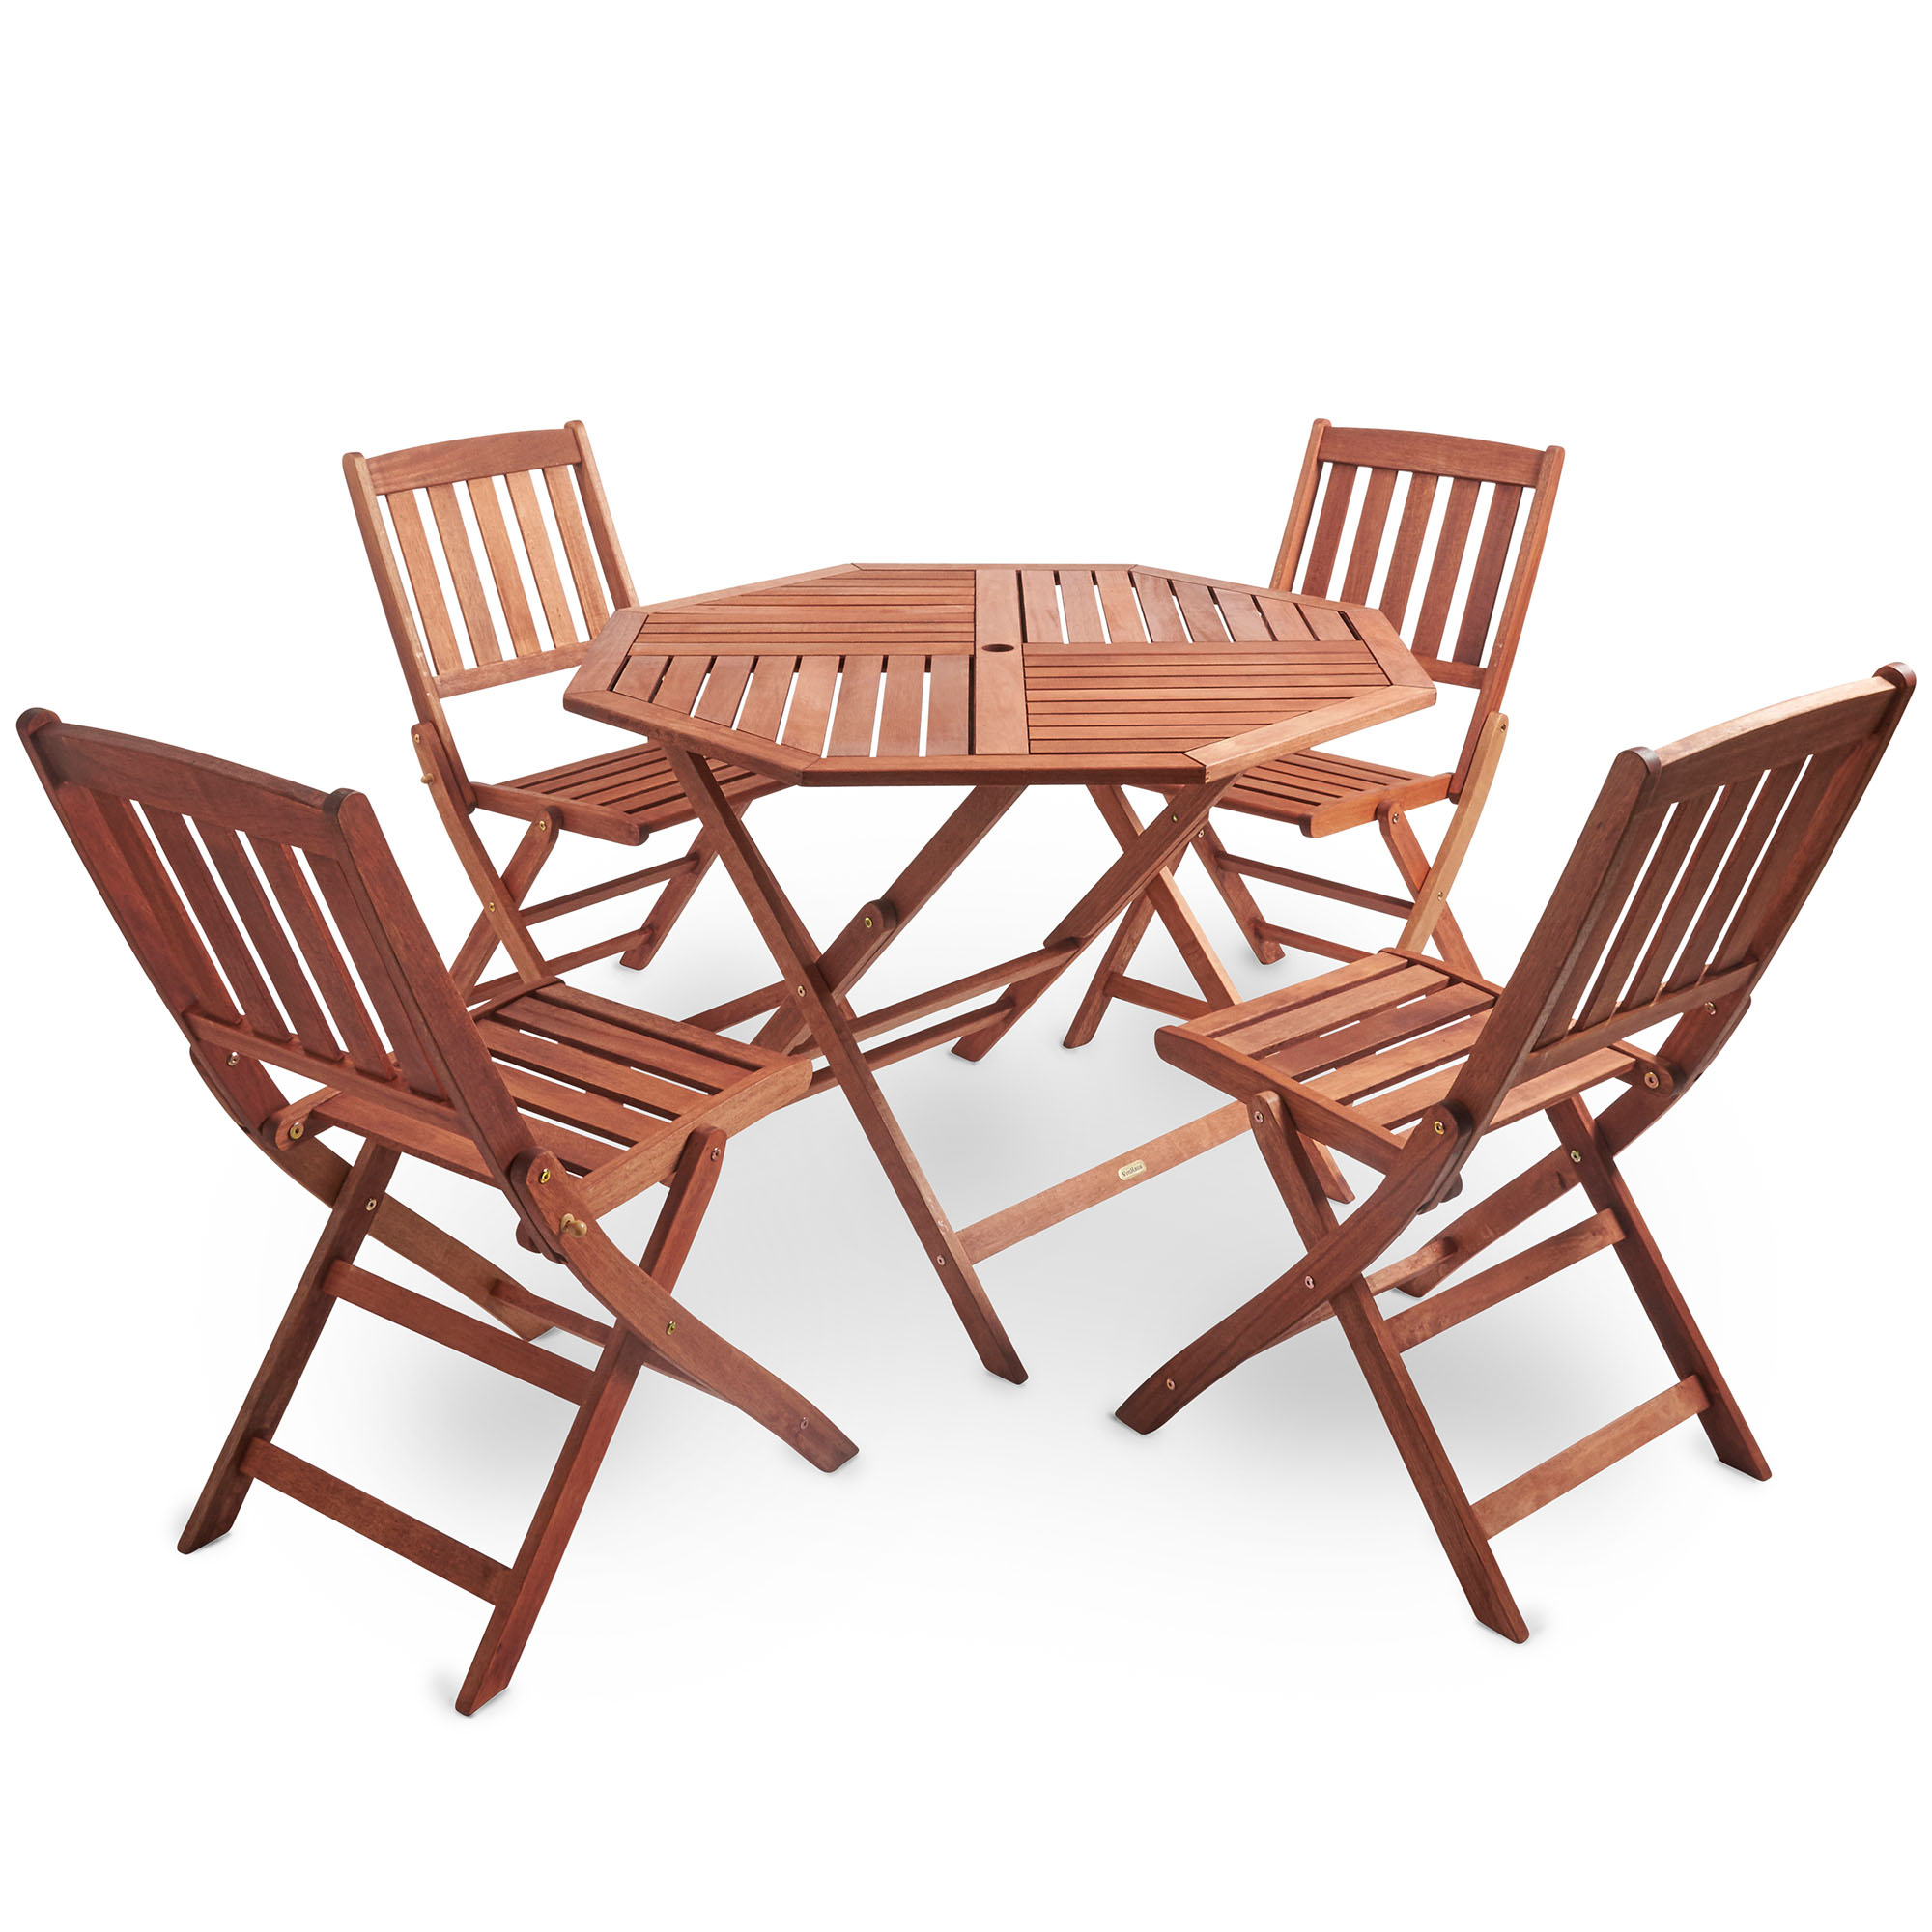 vonhaus outdoor garden dining set hardwood folding octagonal table 4 chairs ebay. Black Bedroom Furniture Sets. Home Design Ideas